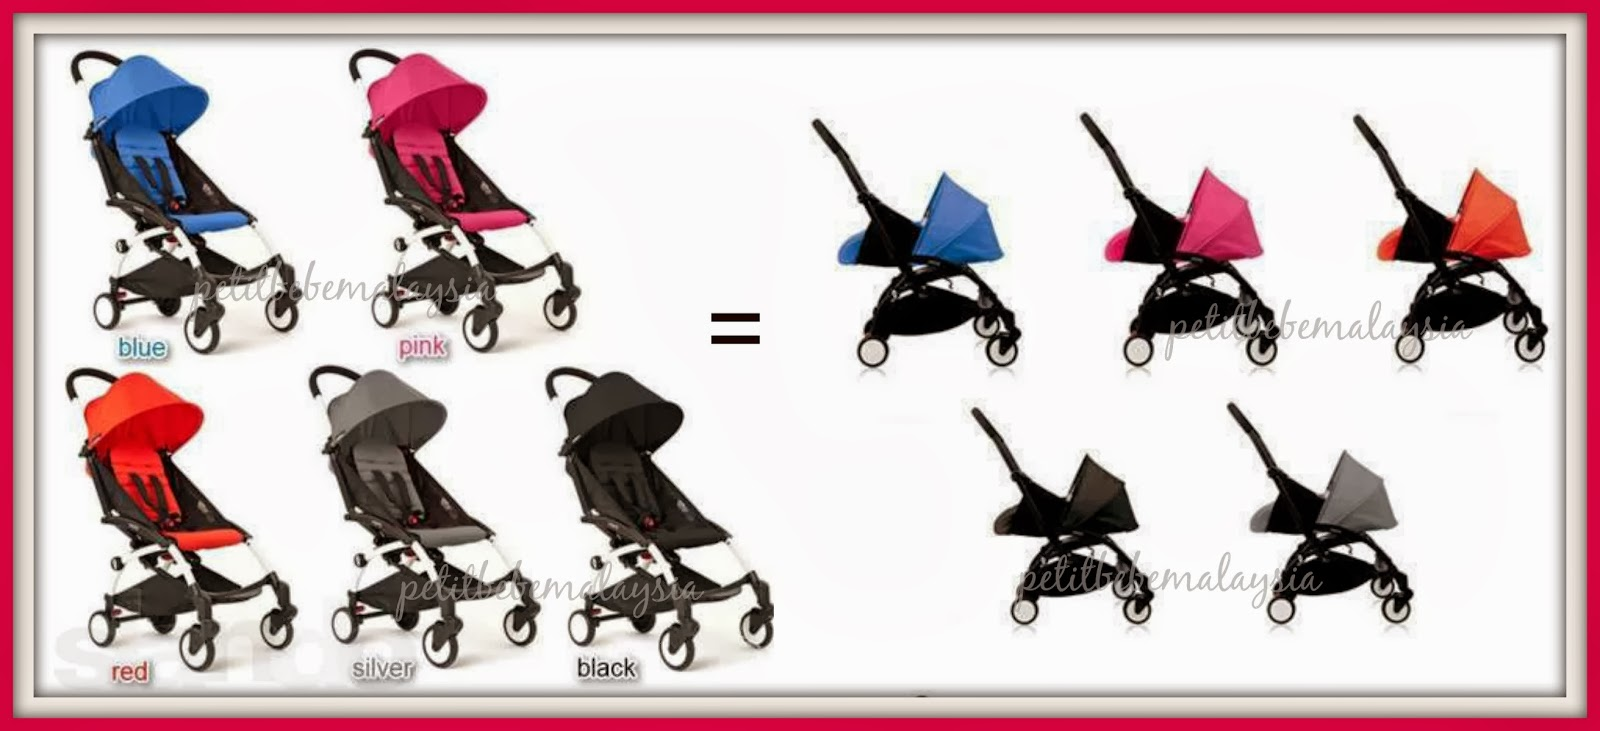 babyzen yoyo colors : Babyzen Yoyo Newborn 2014 Preorder Promo